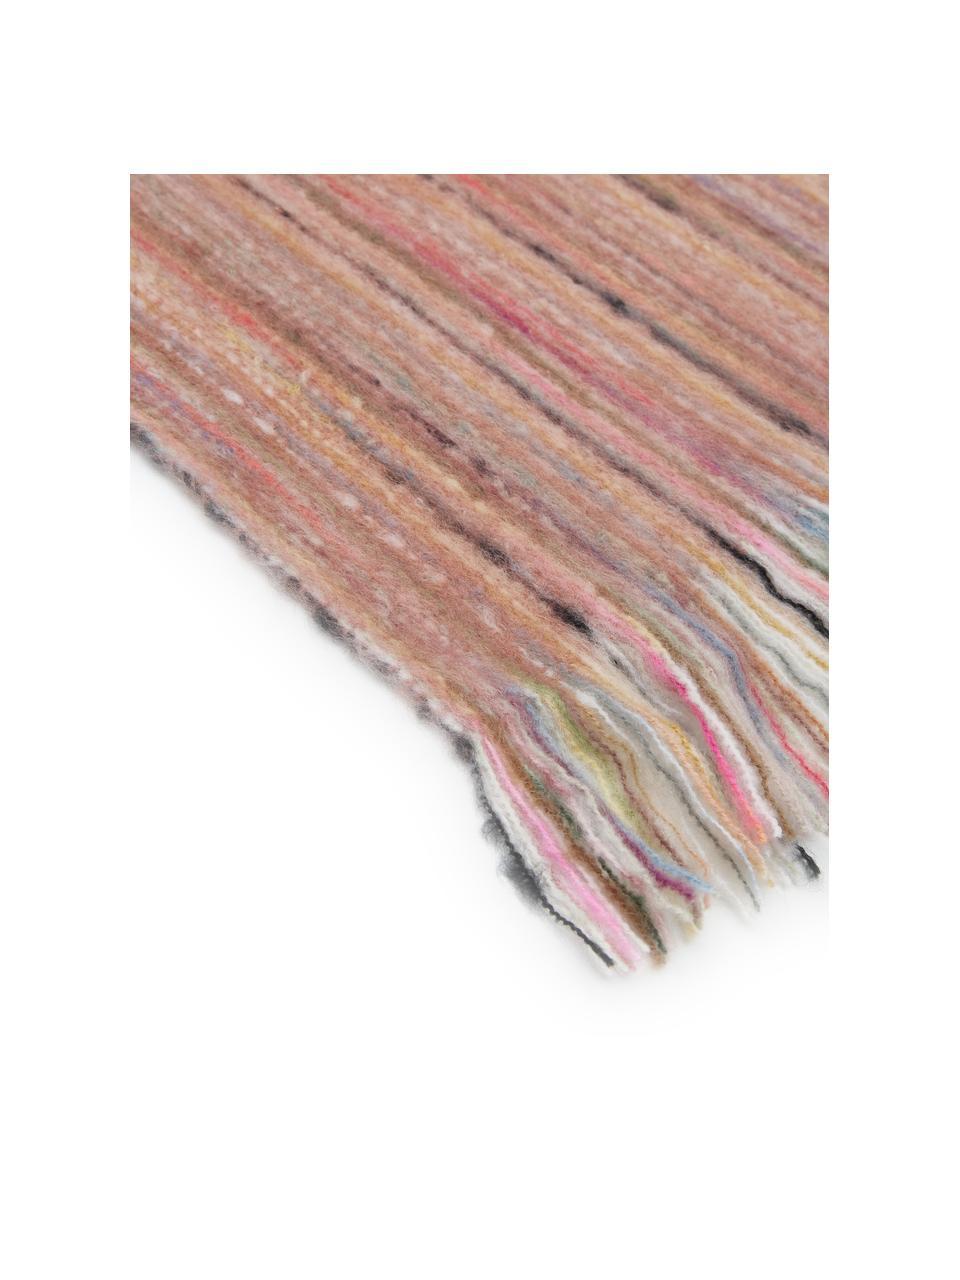 Bunt meliertes Plaid Ayana mit Fransen, 100% Acryl, Altrosa, Mehrfarbig, 130 x 190 cm